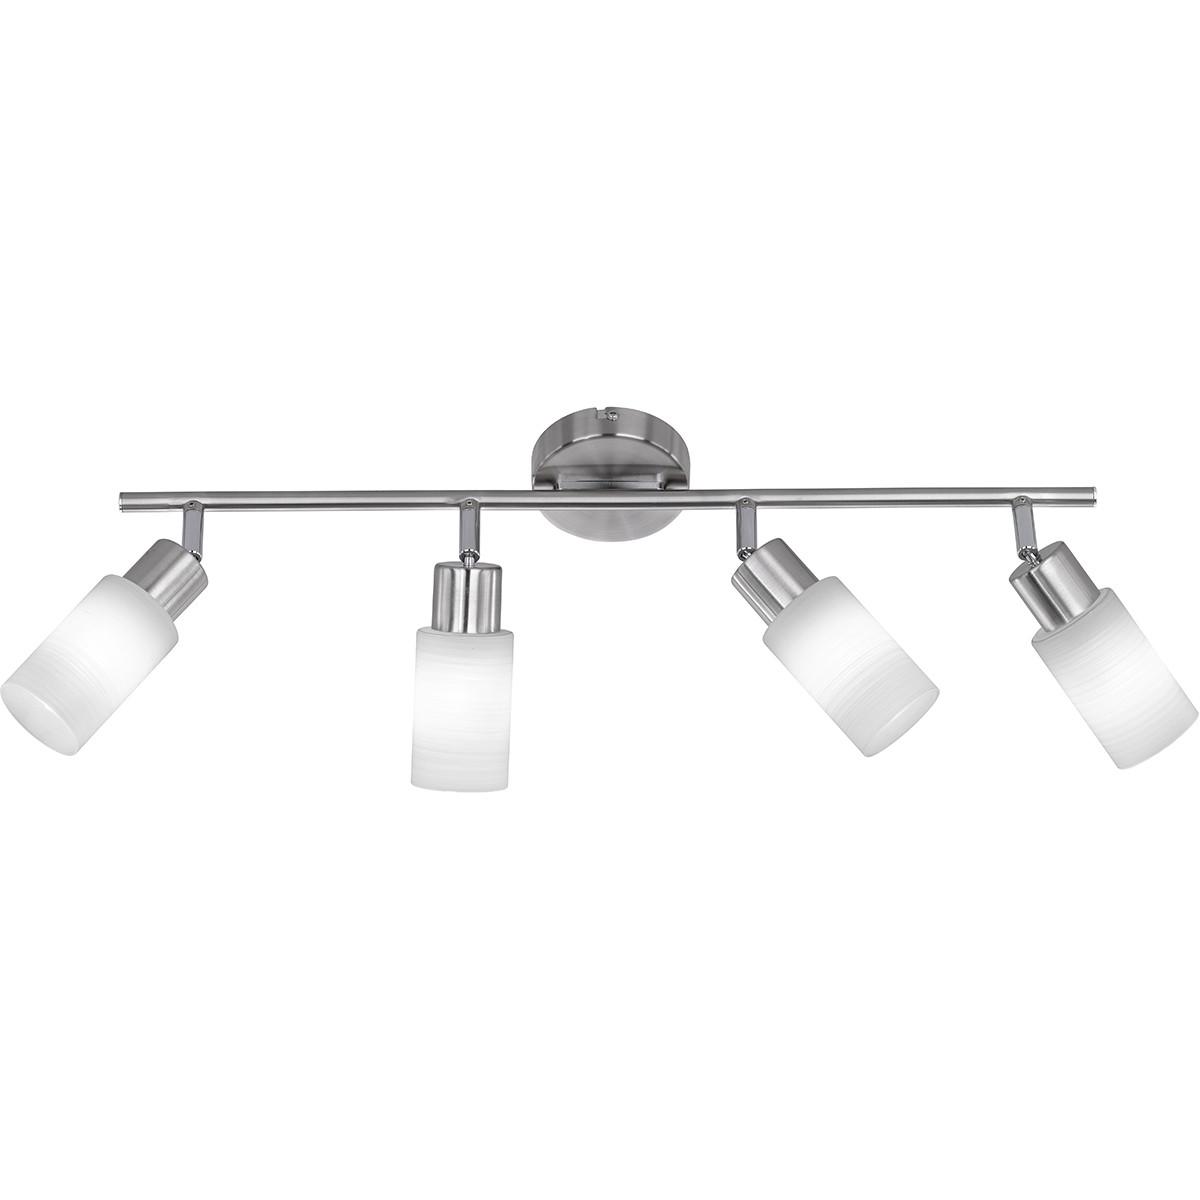 LED Plafondspot - Trion Jolin - E14 Fitting - 16W - Warm Wit 3000K - 4-lichts - Rond - Mat Nikkel -